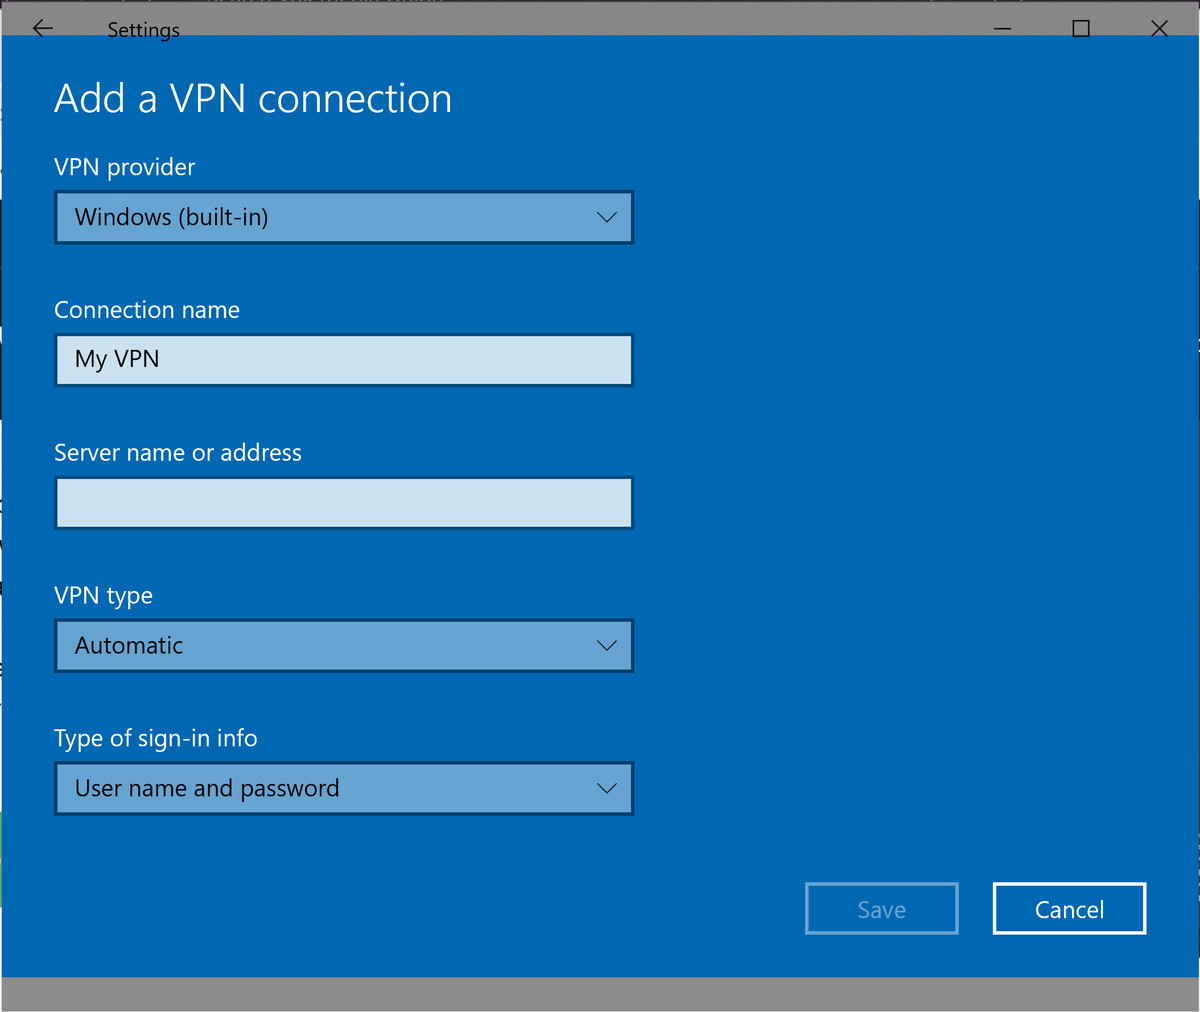 Add a VPN profile in Windows 10.